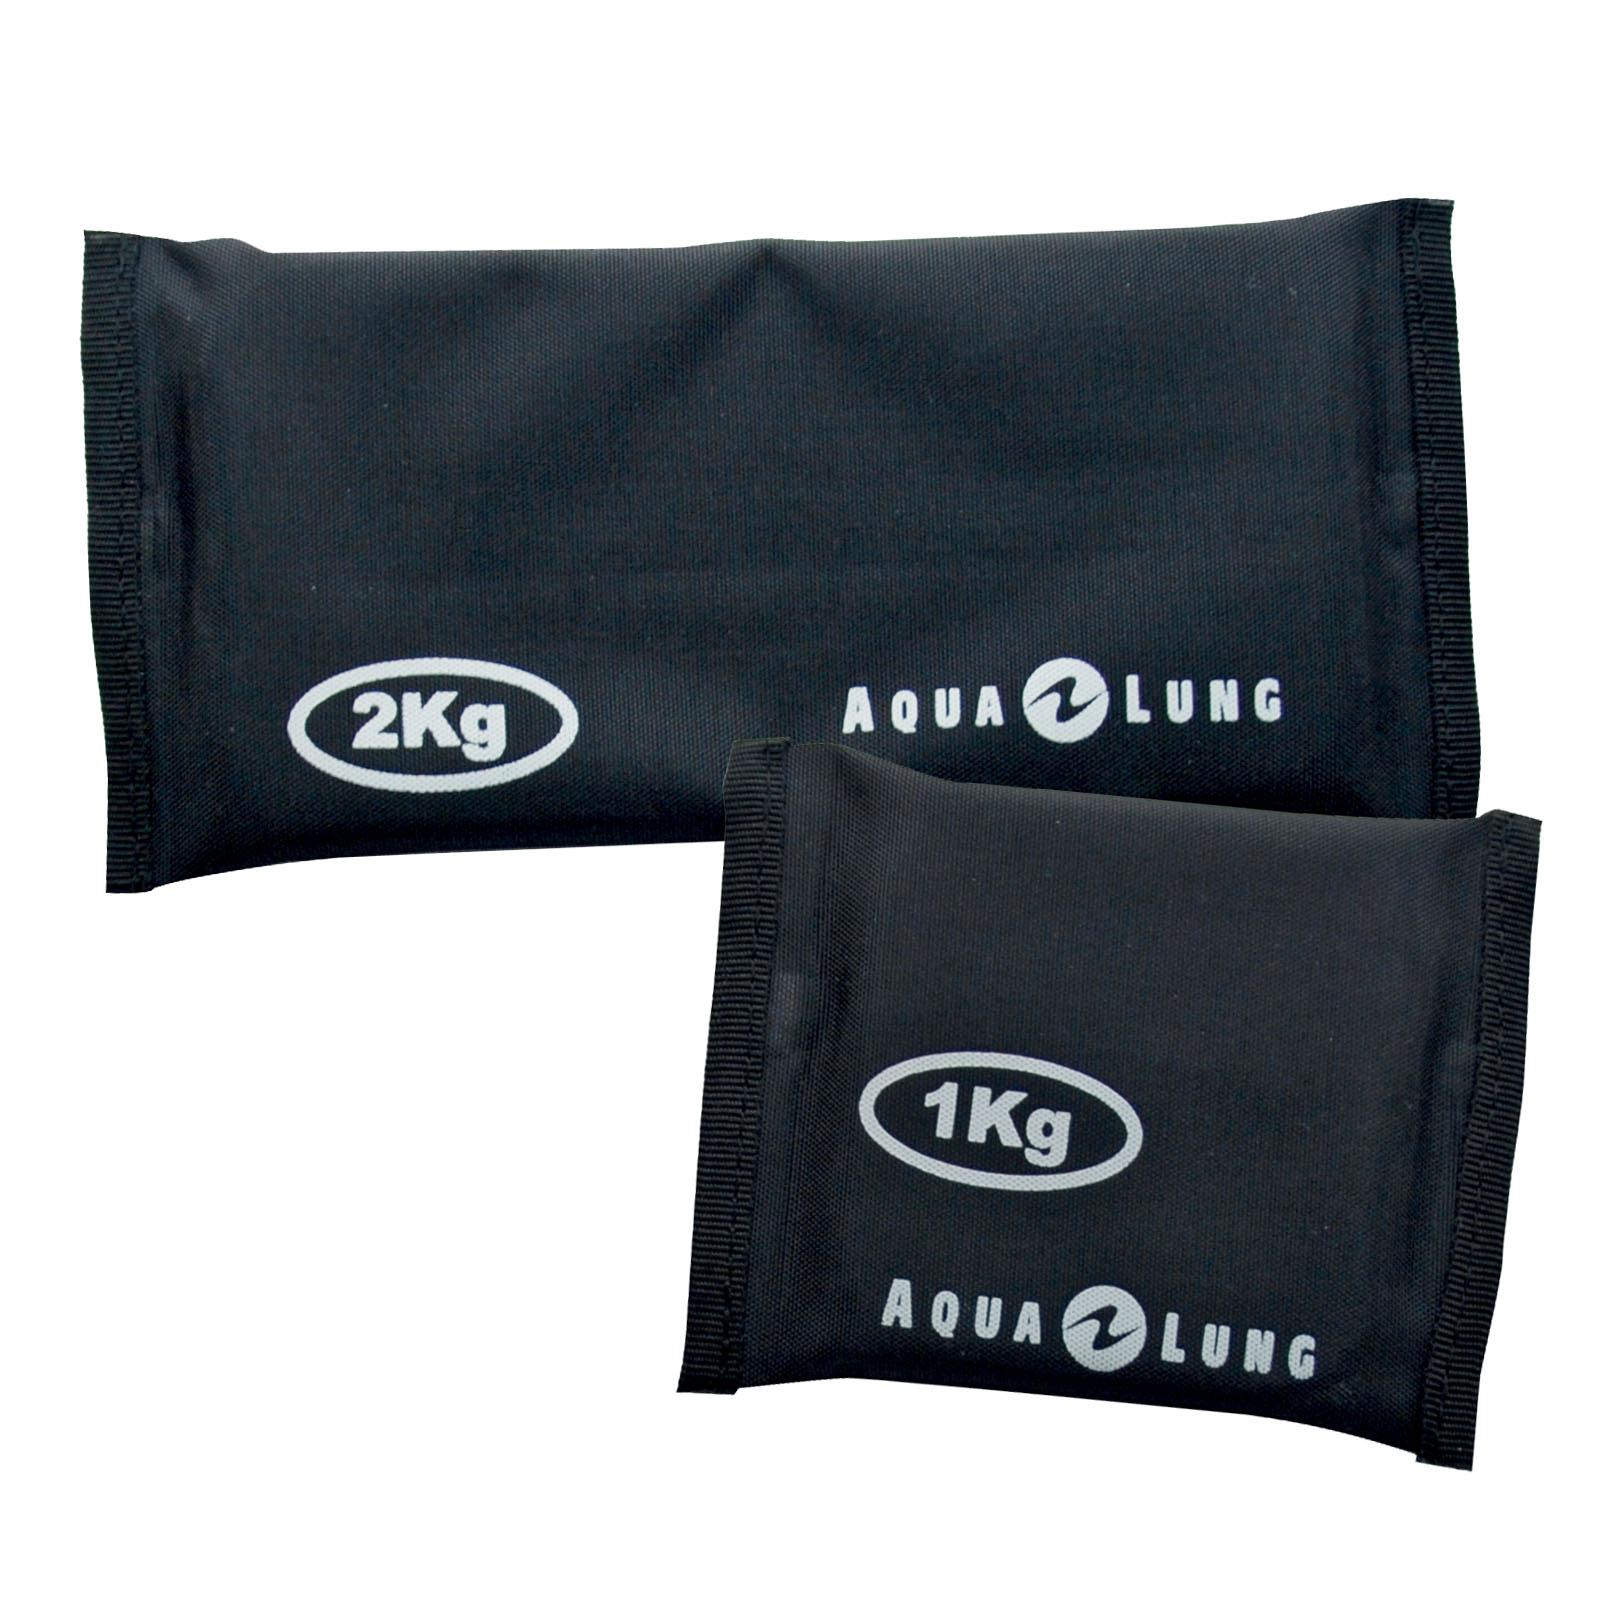 Blei 2 × 1kg ABC & Blei